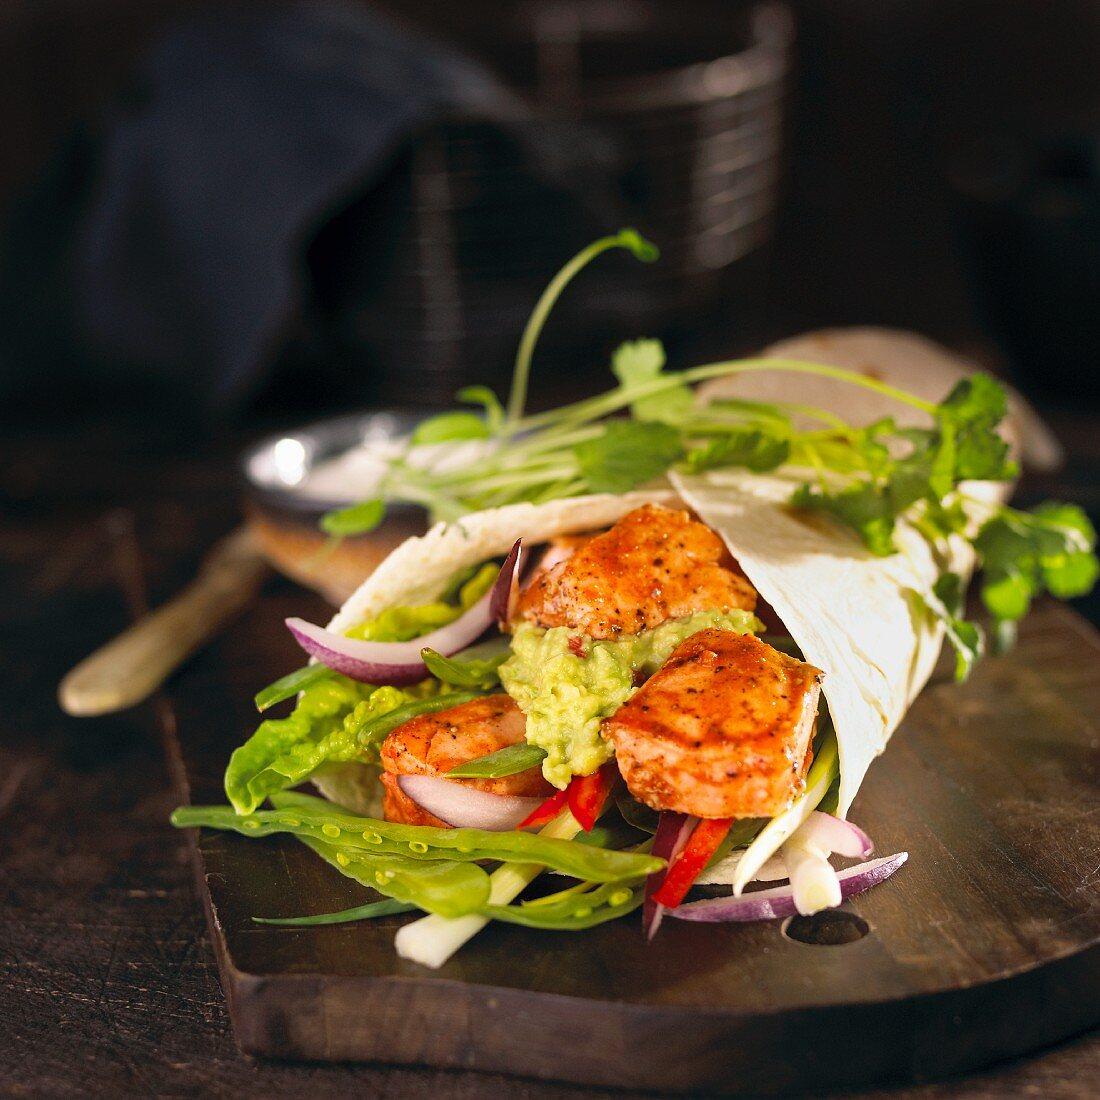 A fish and guacamole wrap (Mexico)